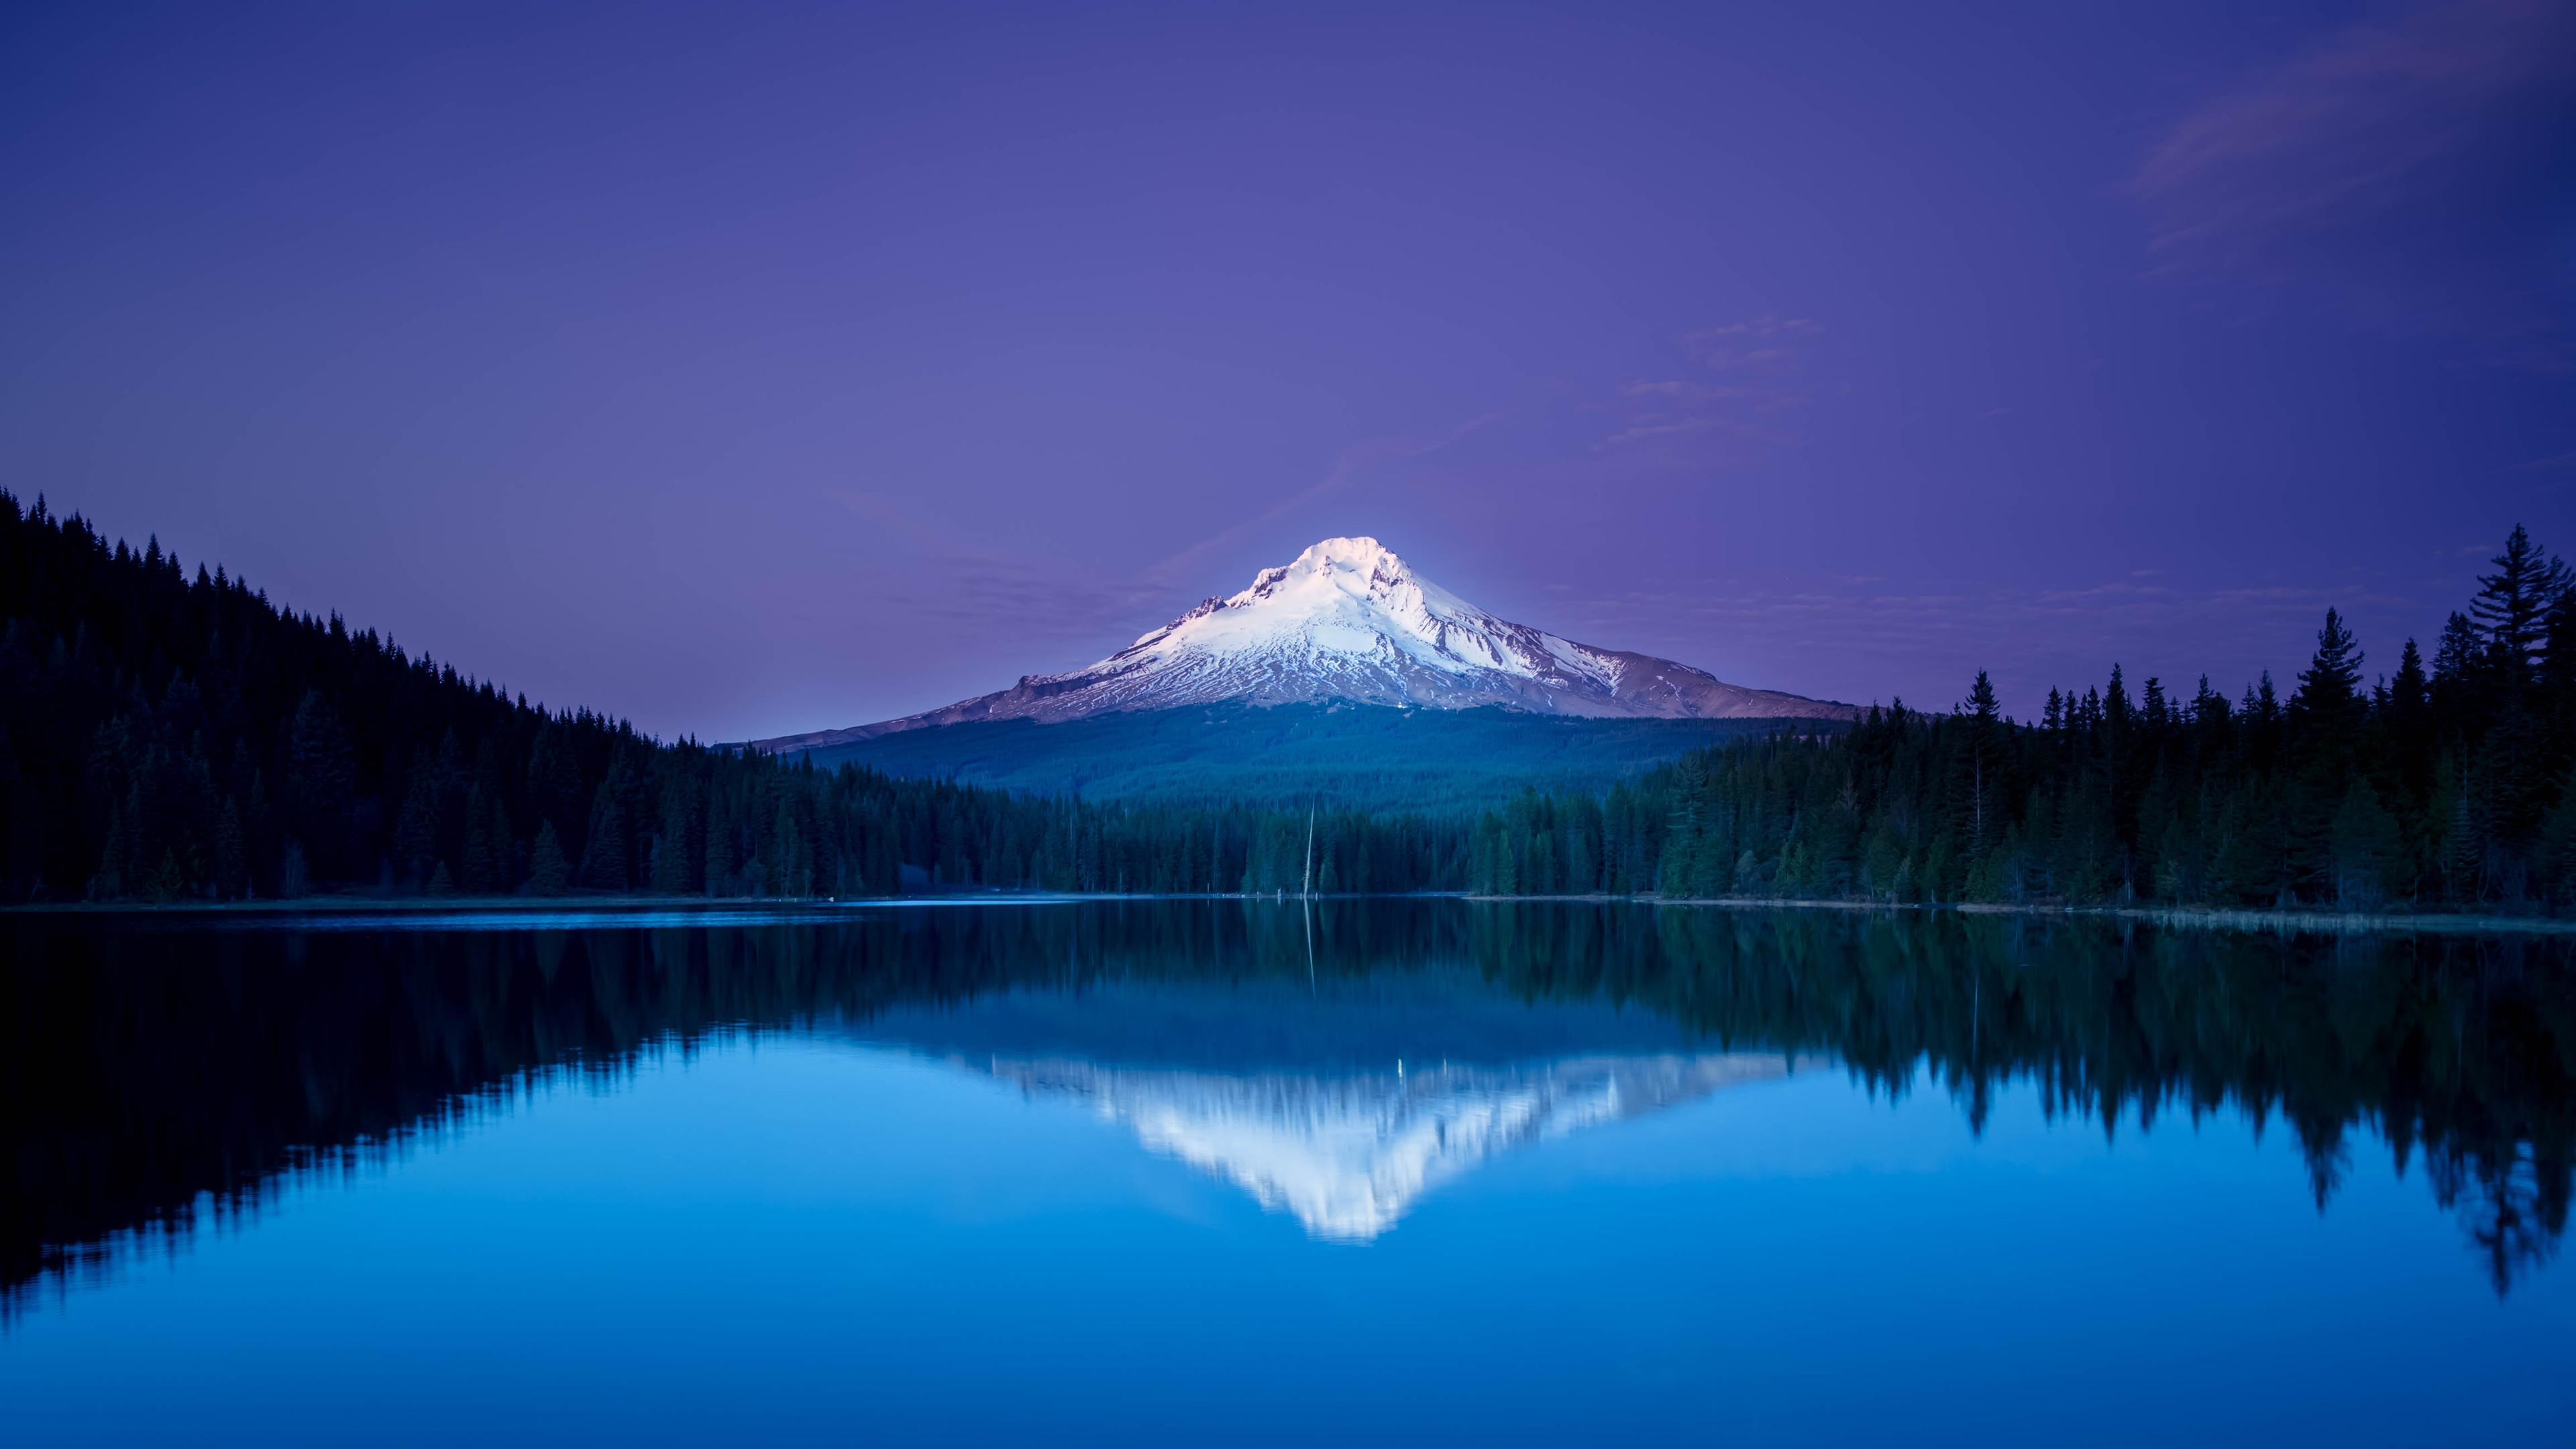 Reflection 4k Ultra HD Wallpaper | Background Image ...